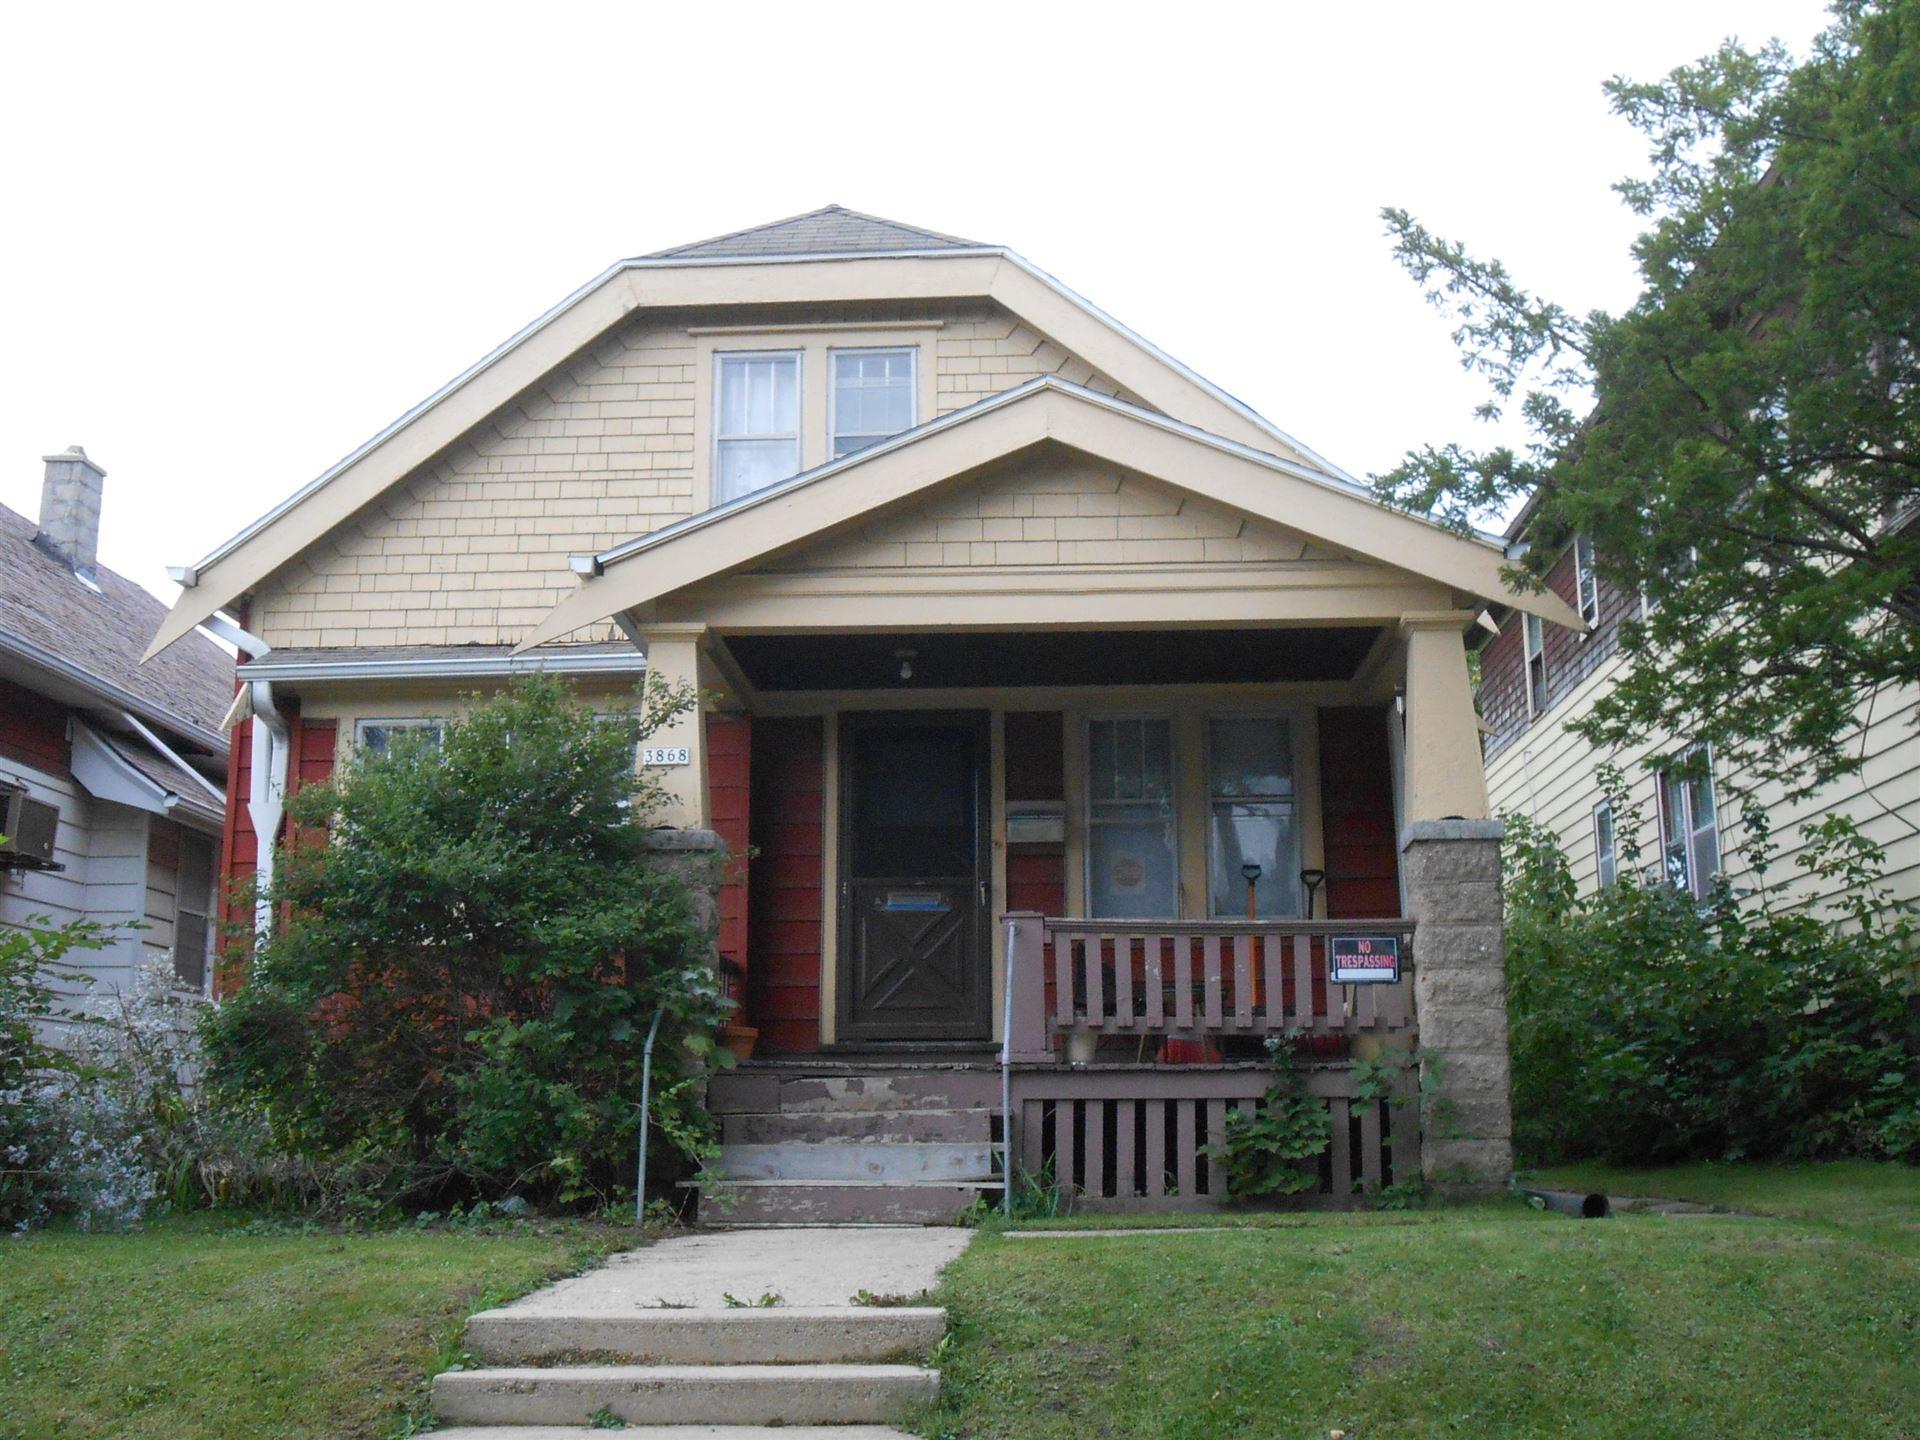 3868 N 15th St, Milwaukee, WI 53206 - #: 1715161